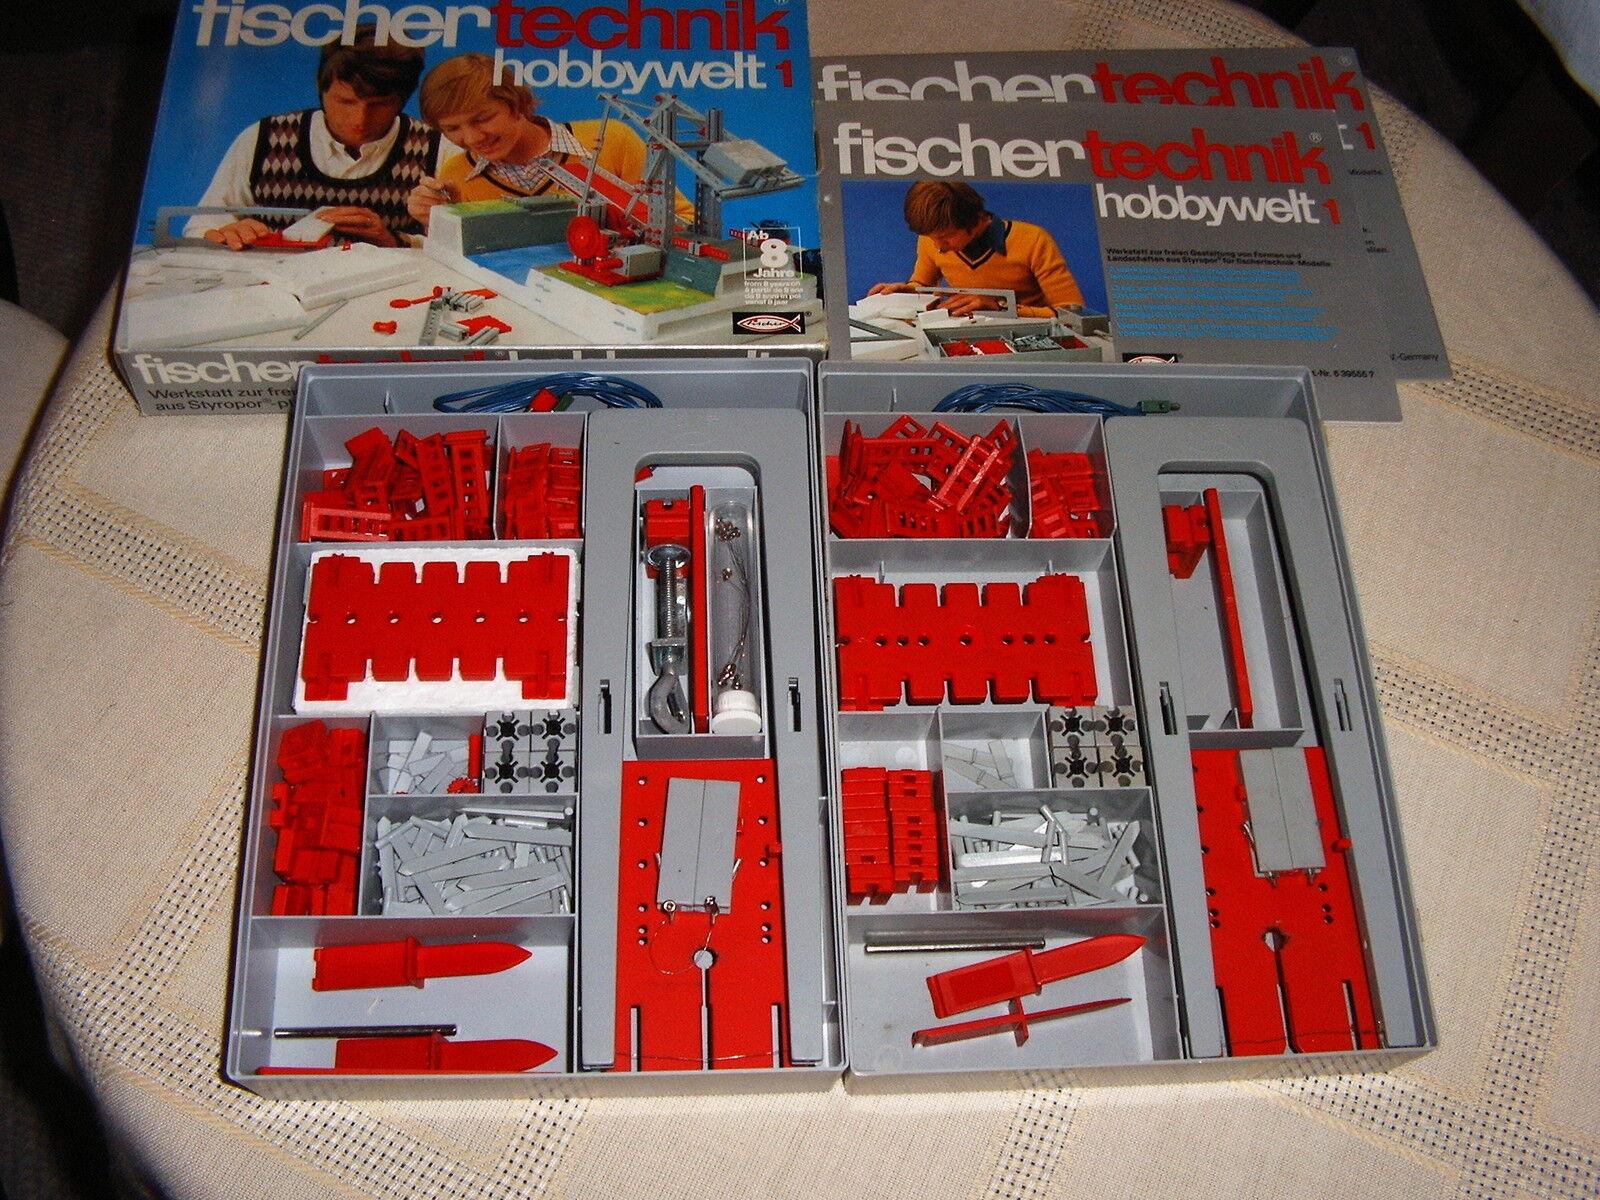 Fischertechnik Baukasten hobbywelt hobbywelt hobbywelt 1 x OVP mit Buch Blister 2 Stück f379e5